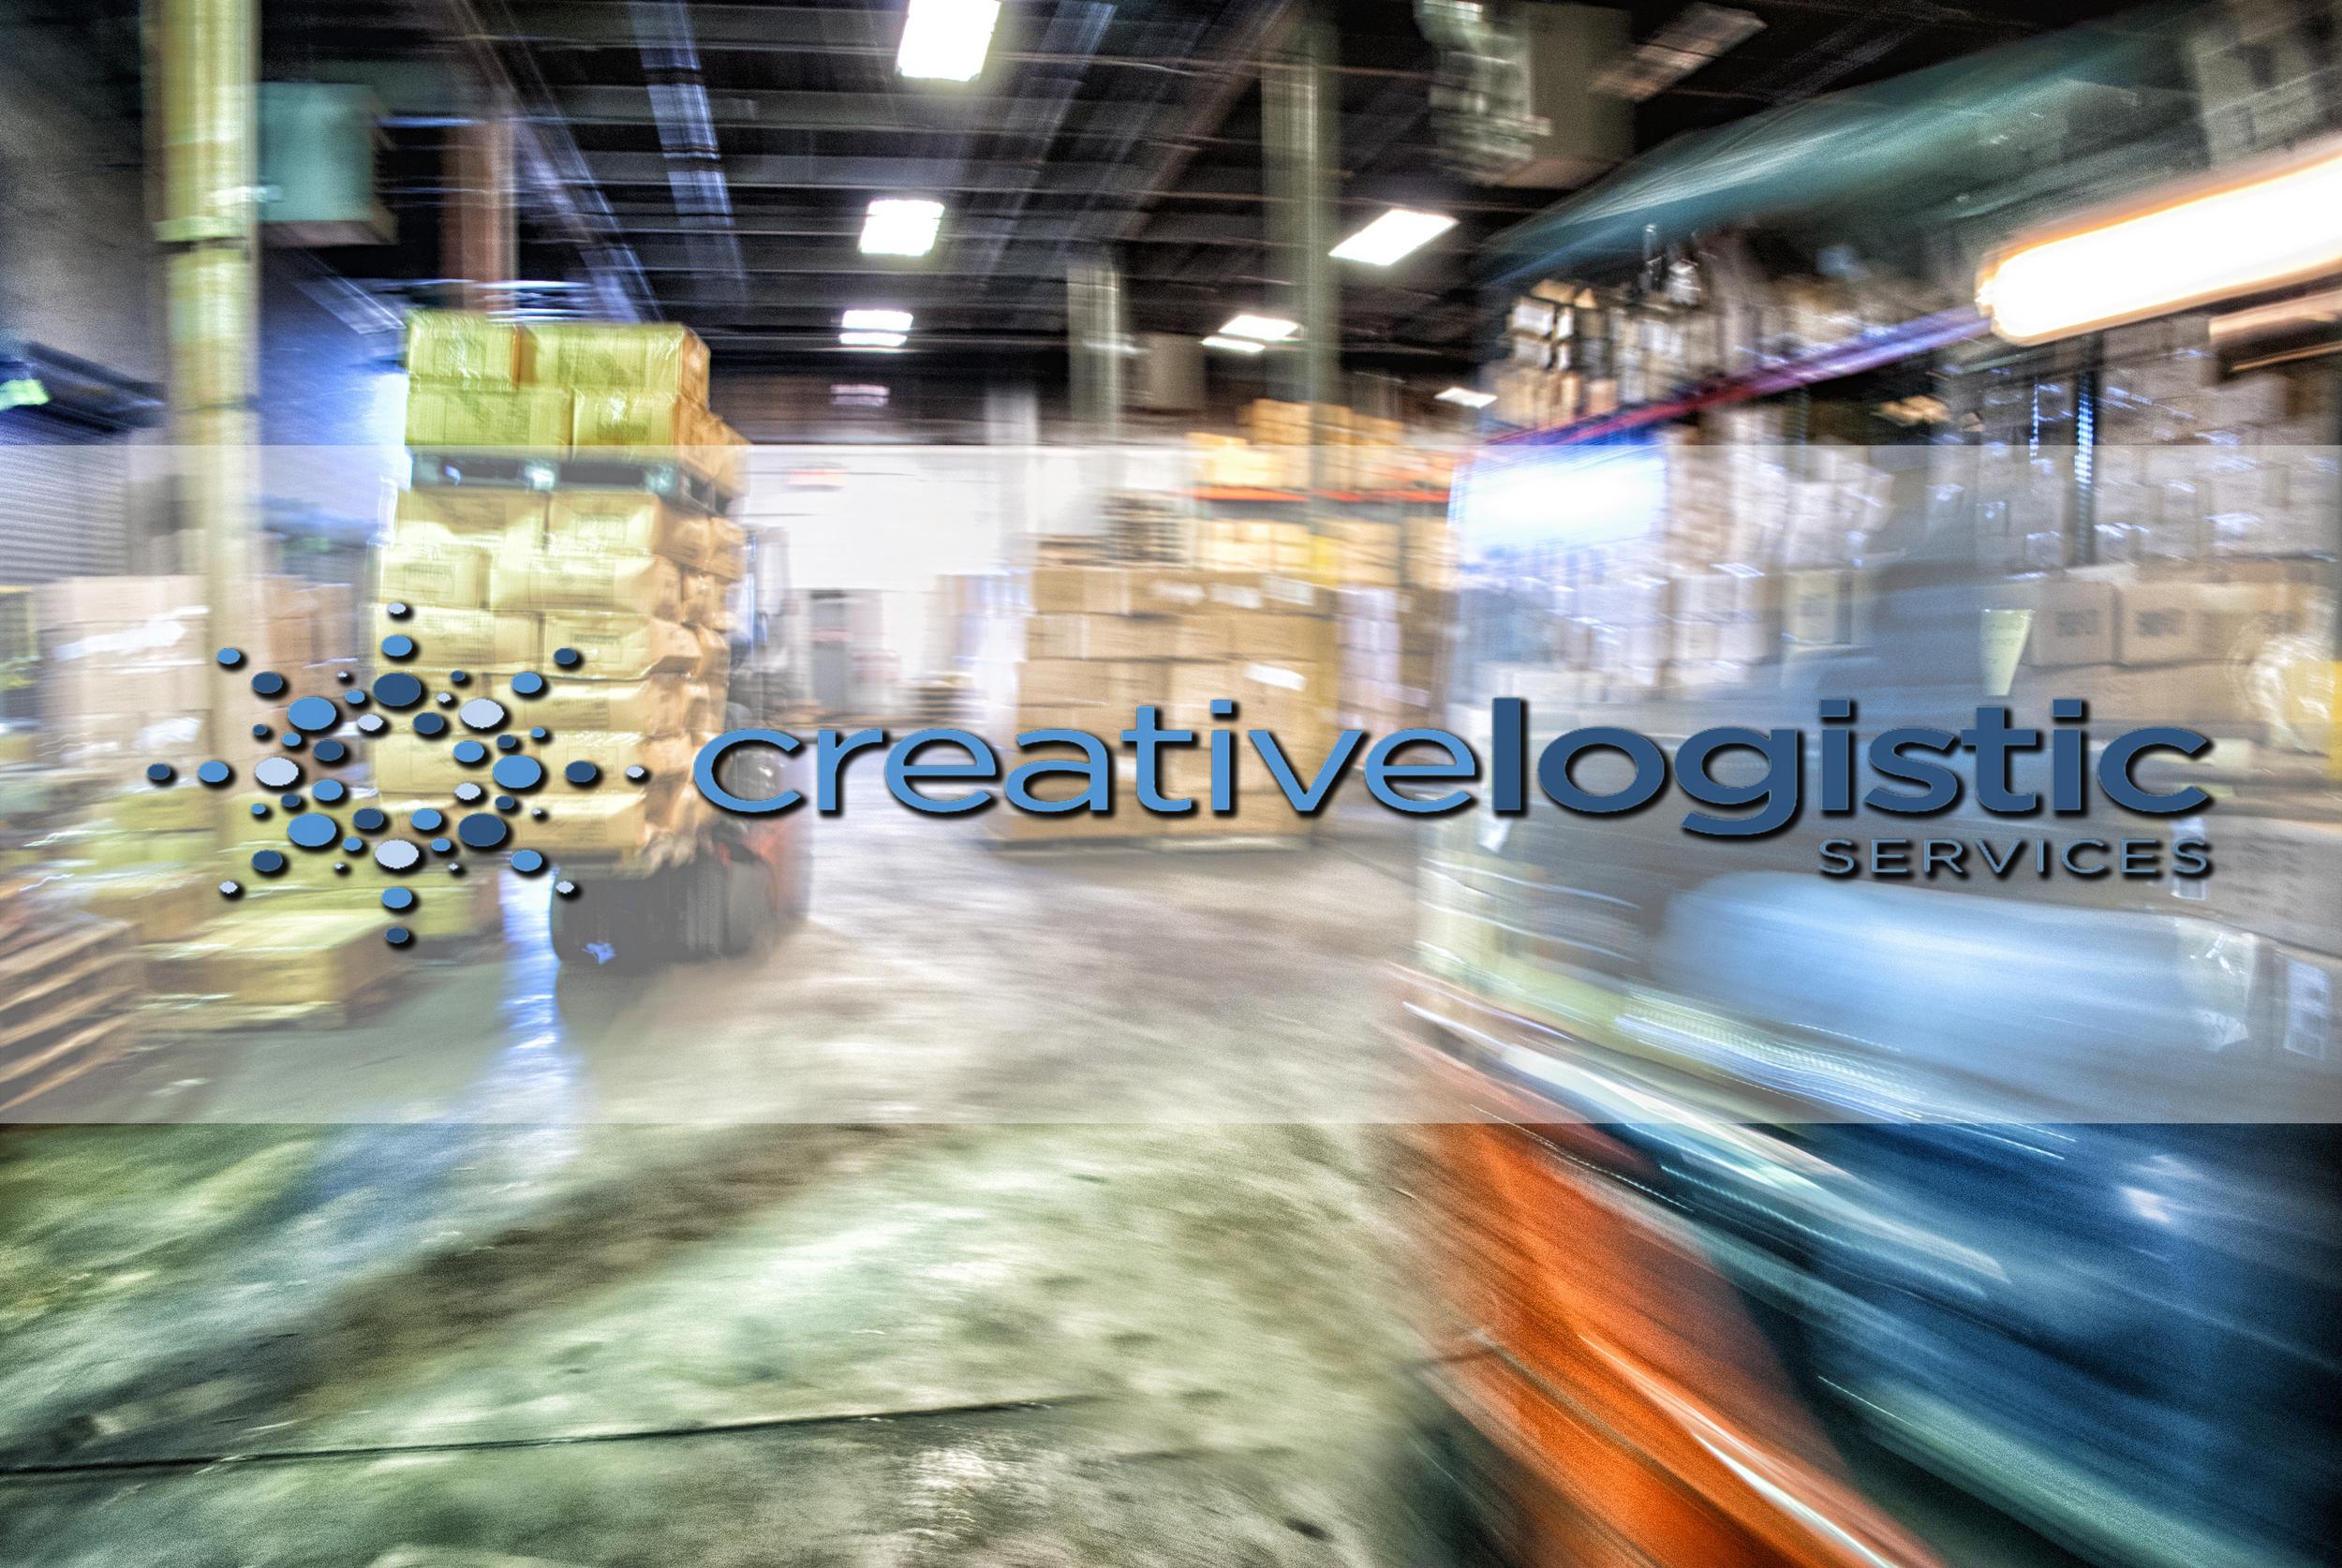 CREATIVE LOGICSTIC SERVICES